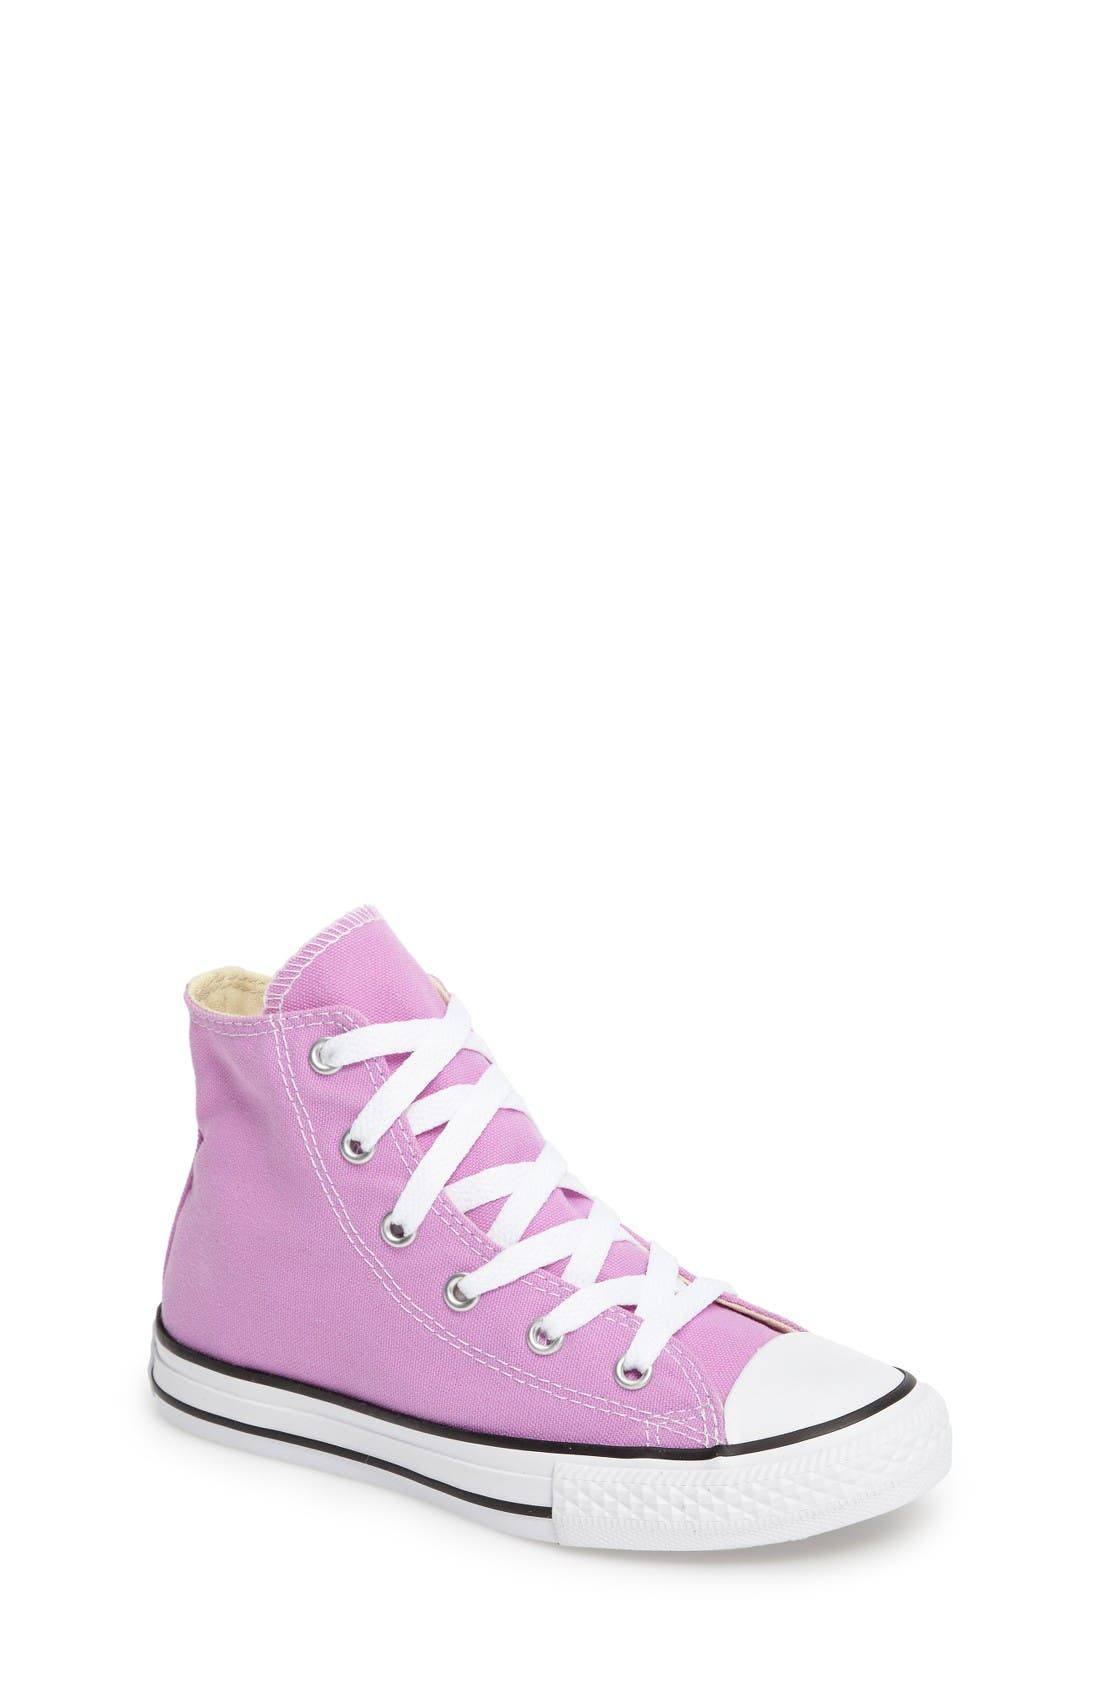 Converse Chuck Taylor® Seasonal High Top Sneaker (Baby, Walker, Toddler, Little Kid & Big Kid)